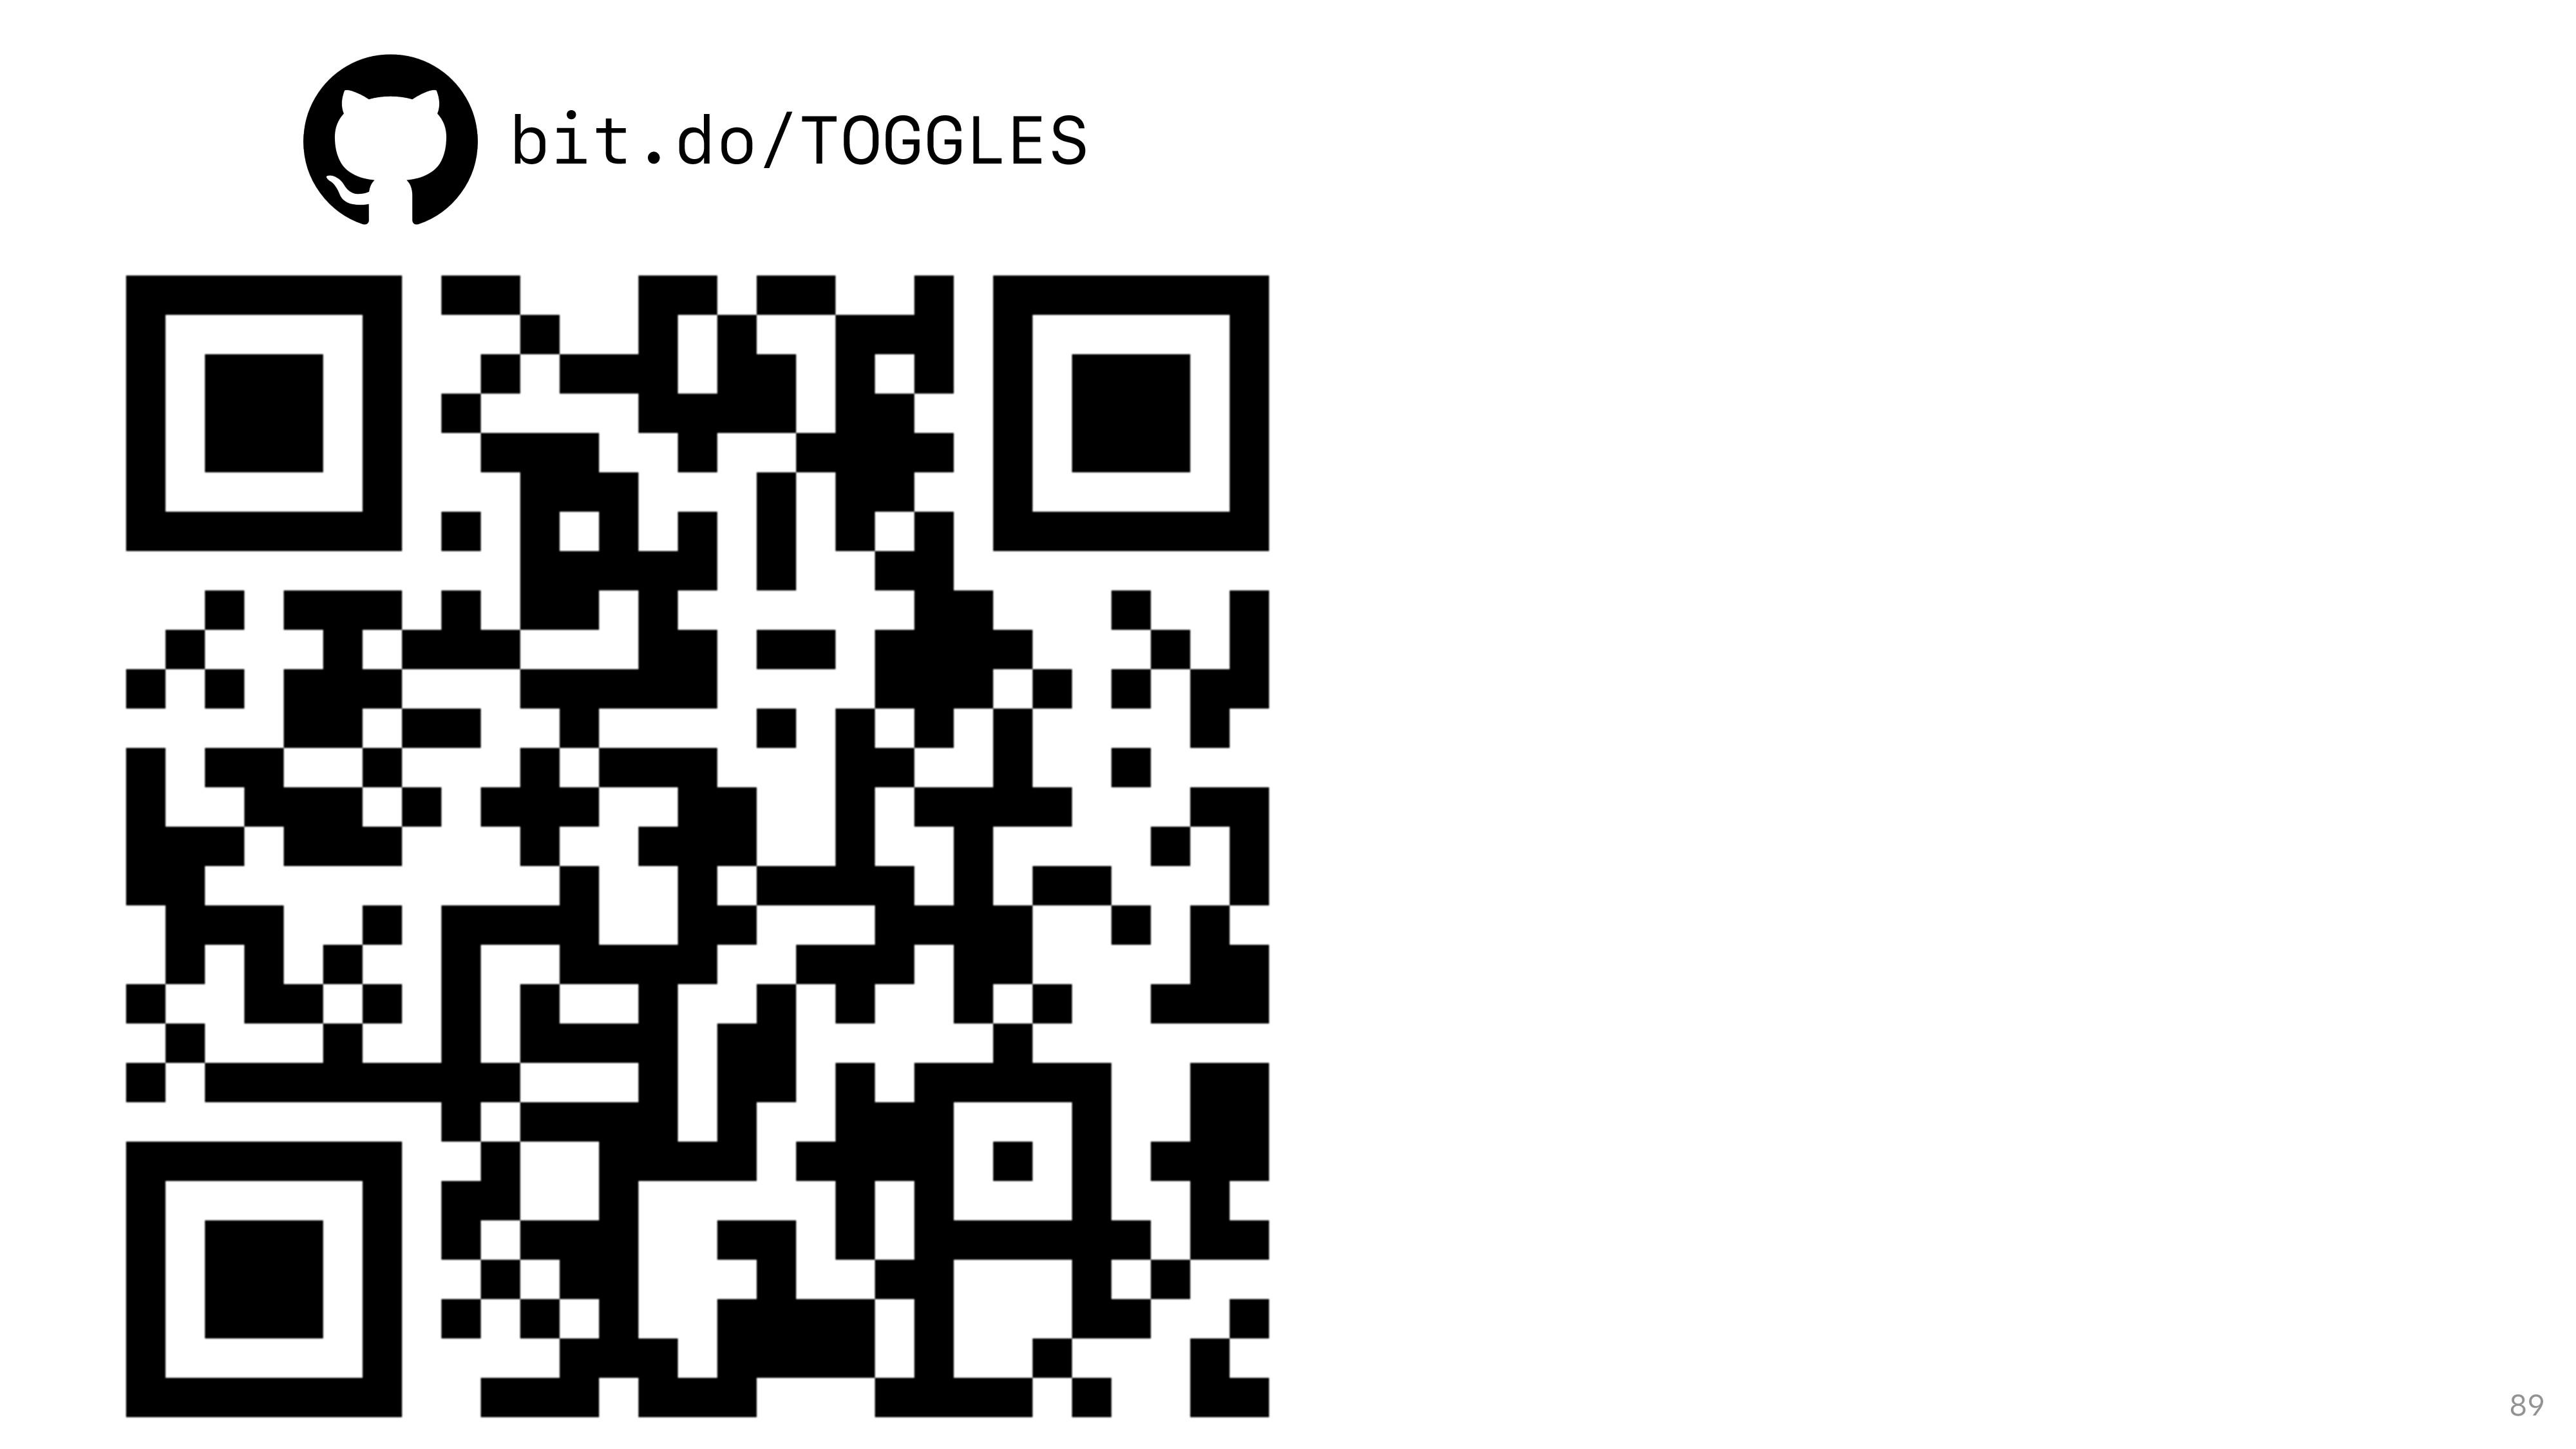 bit.do/TOGGLES 89